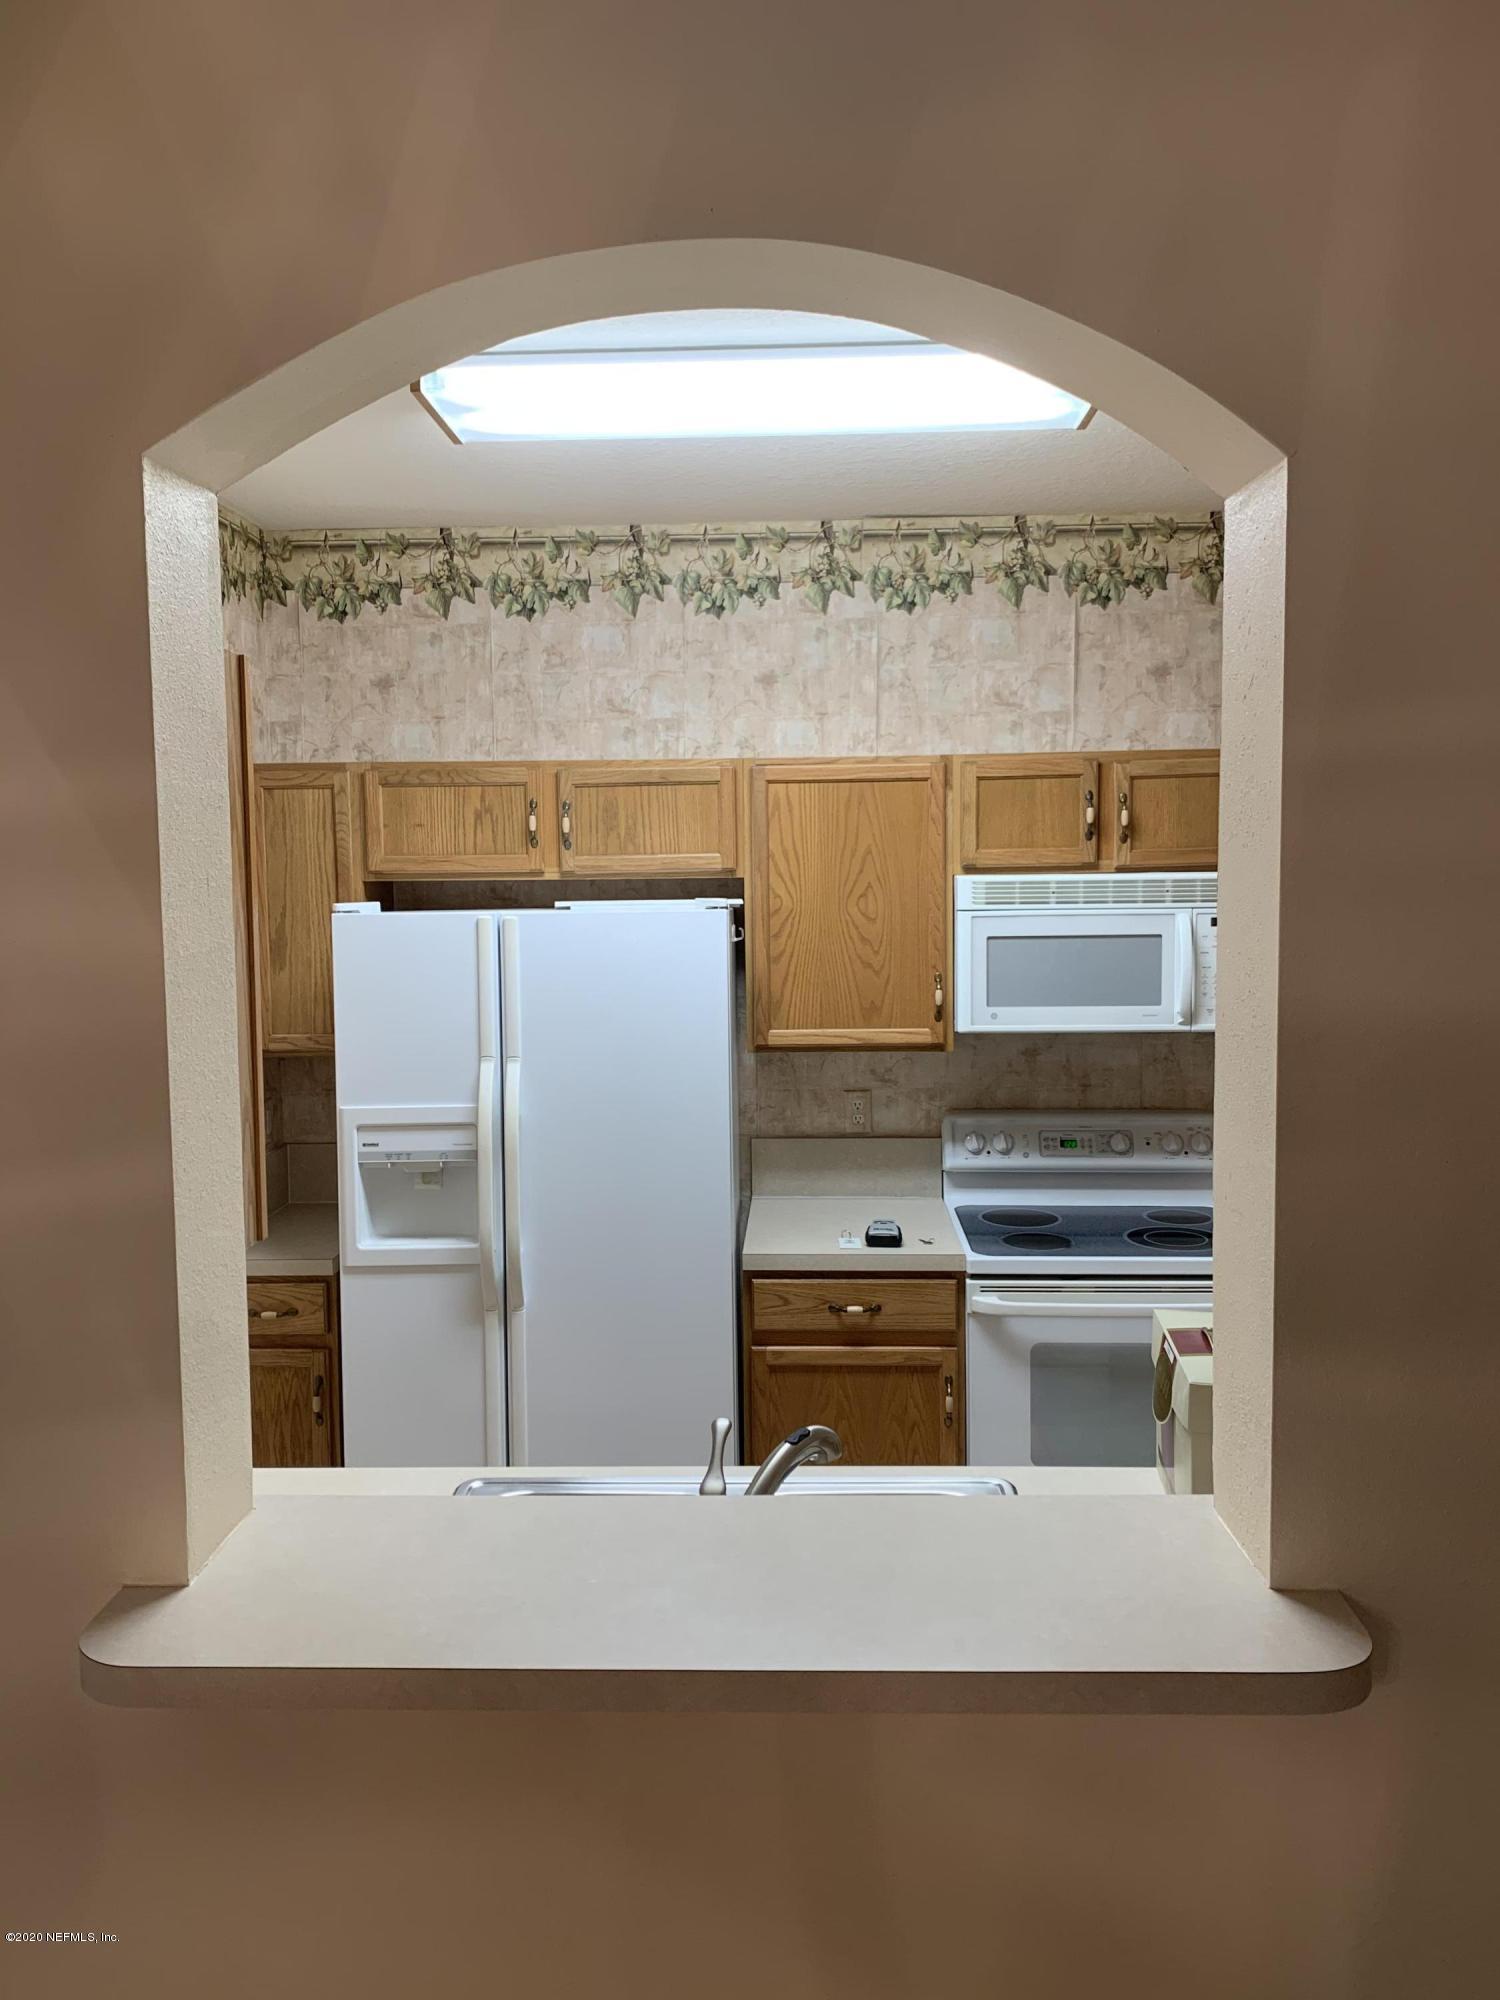 10550 BAYMEADOWS, JACKSONVILLE, FLORIDA 32256, 3 Bedrooms Bedrooms, ,2 BathroomsBathrooms,Residential,For sale,BAYMEADOWS,1082006